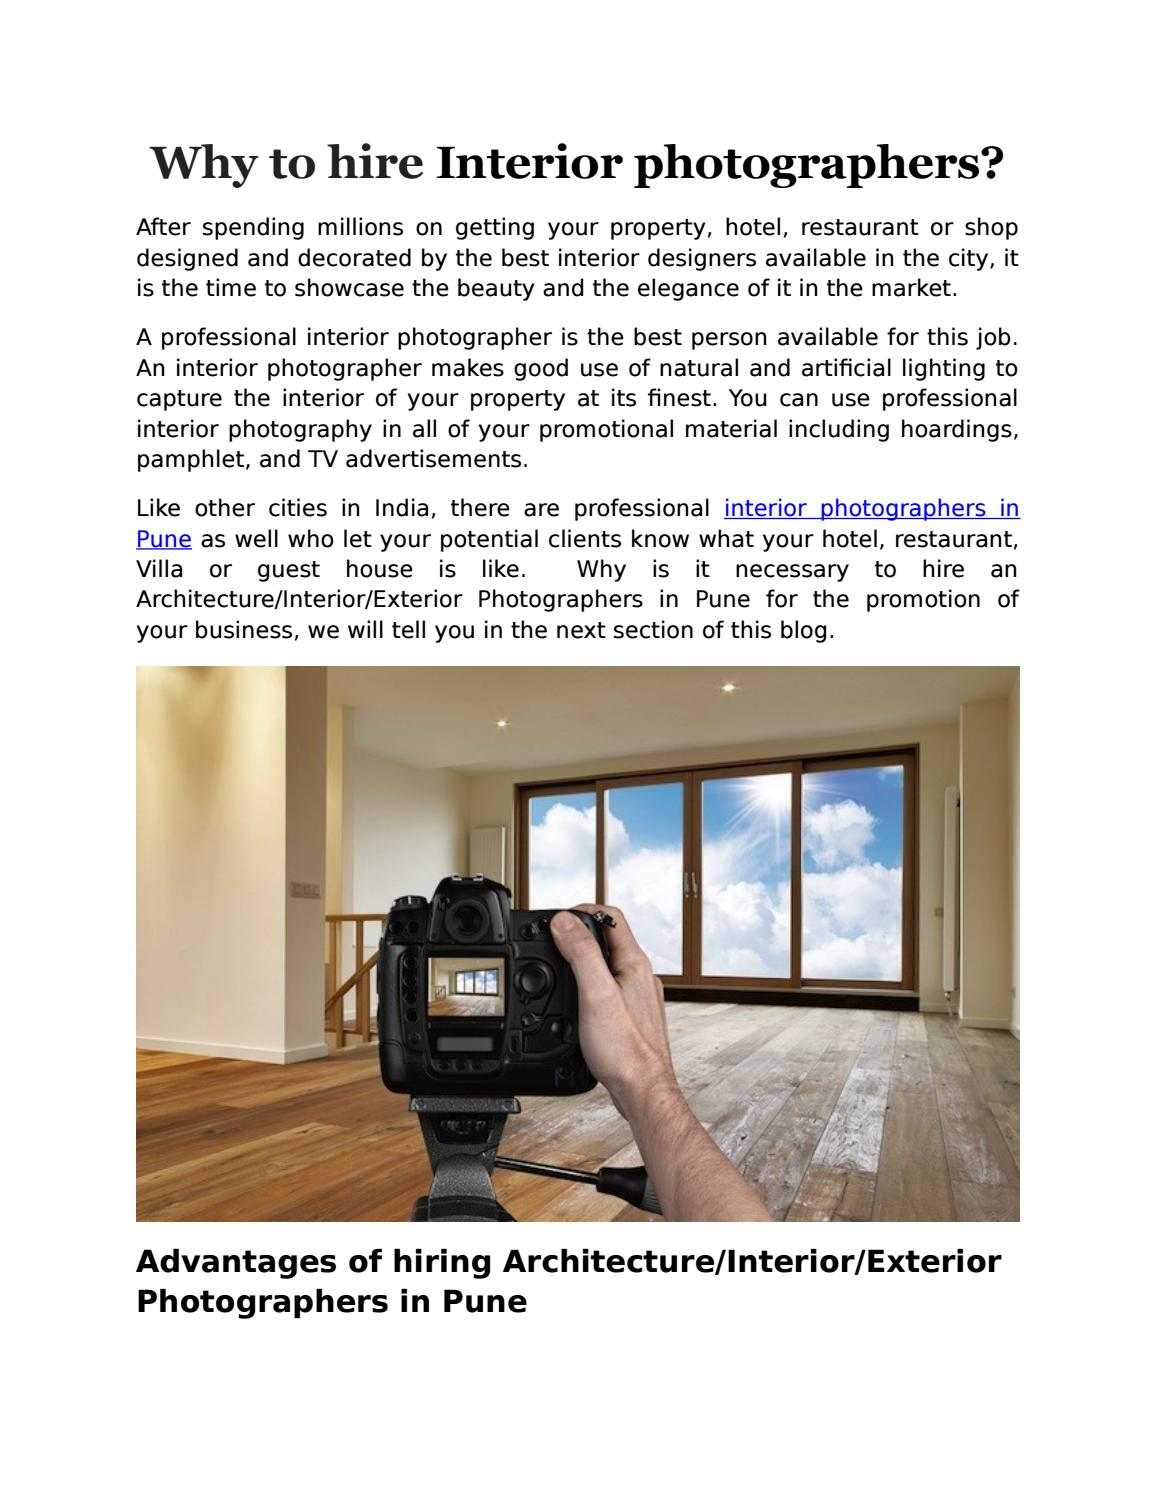 Why to hire interior photographers by Angad Joshi - issuu